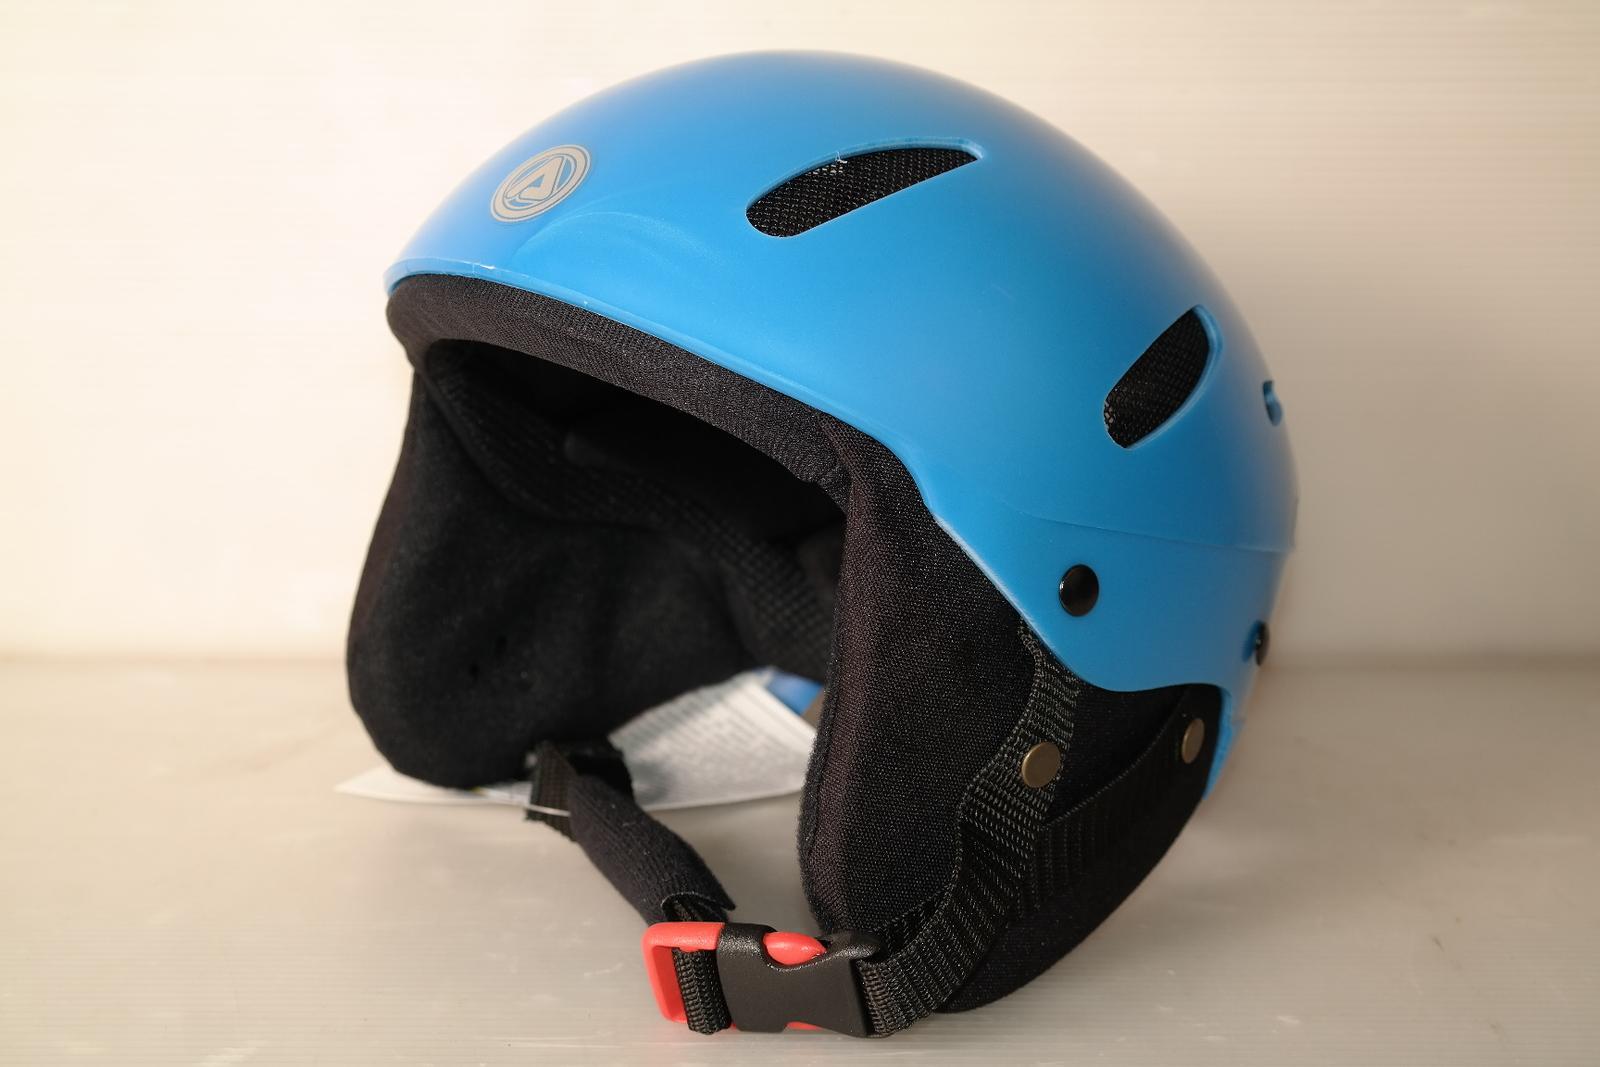 Dámská lyžařská helma Acerbis Azzurro vel. 60